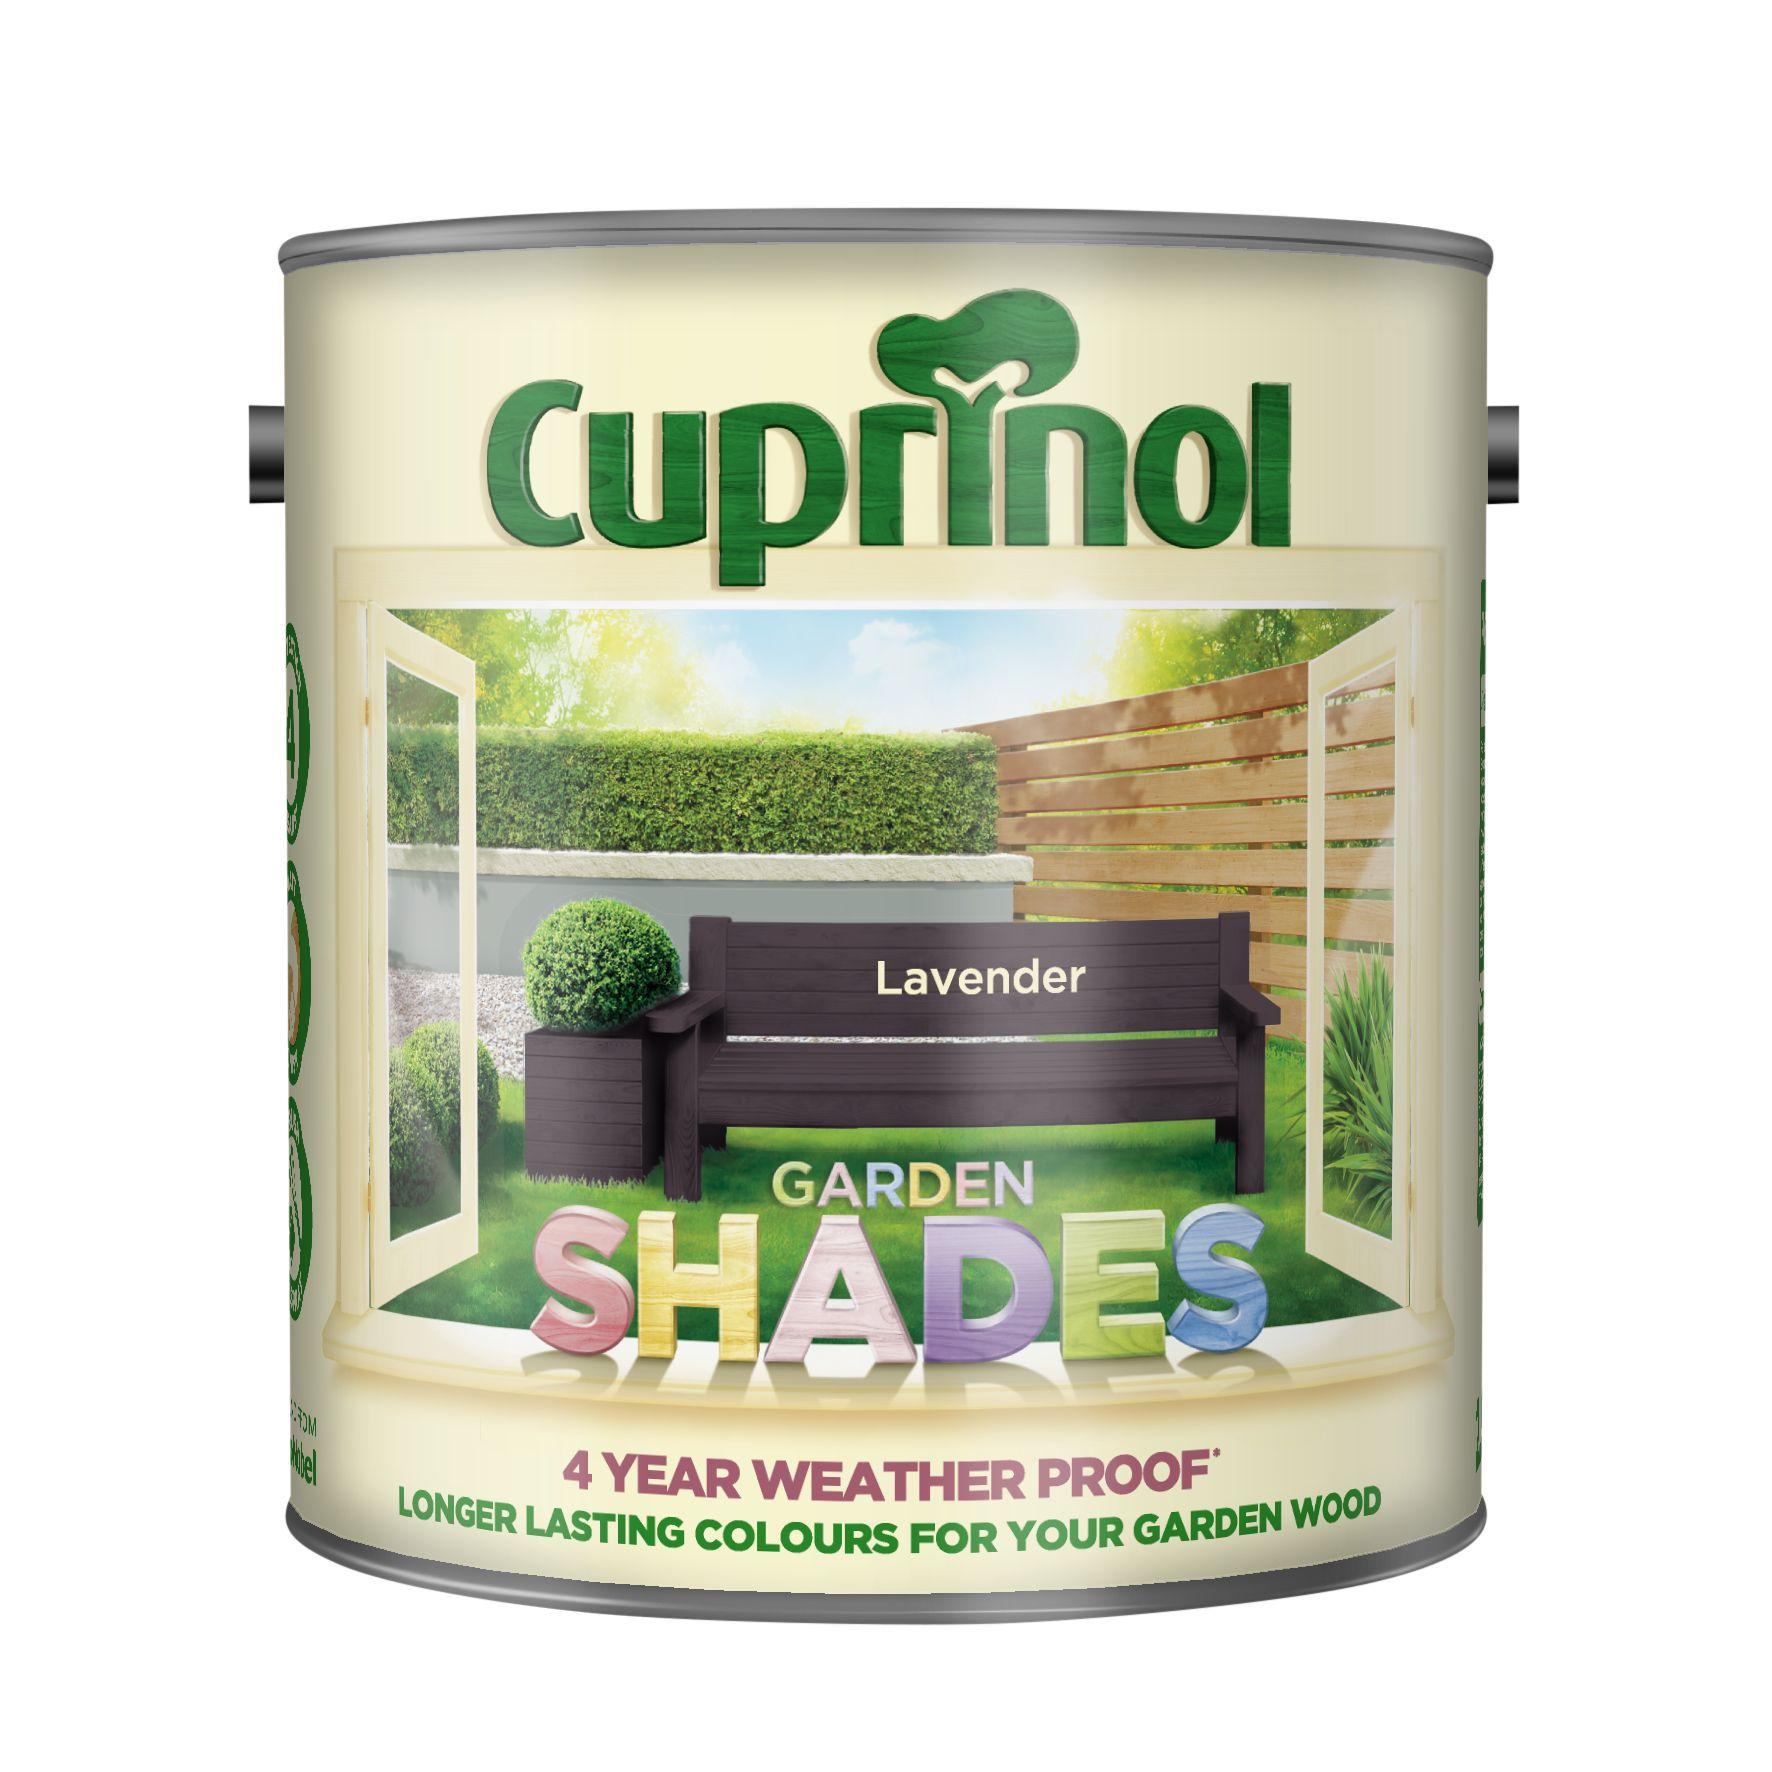 Cuprinol Garden Shades Lavender Matt Wood Paint 5L